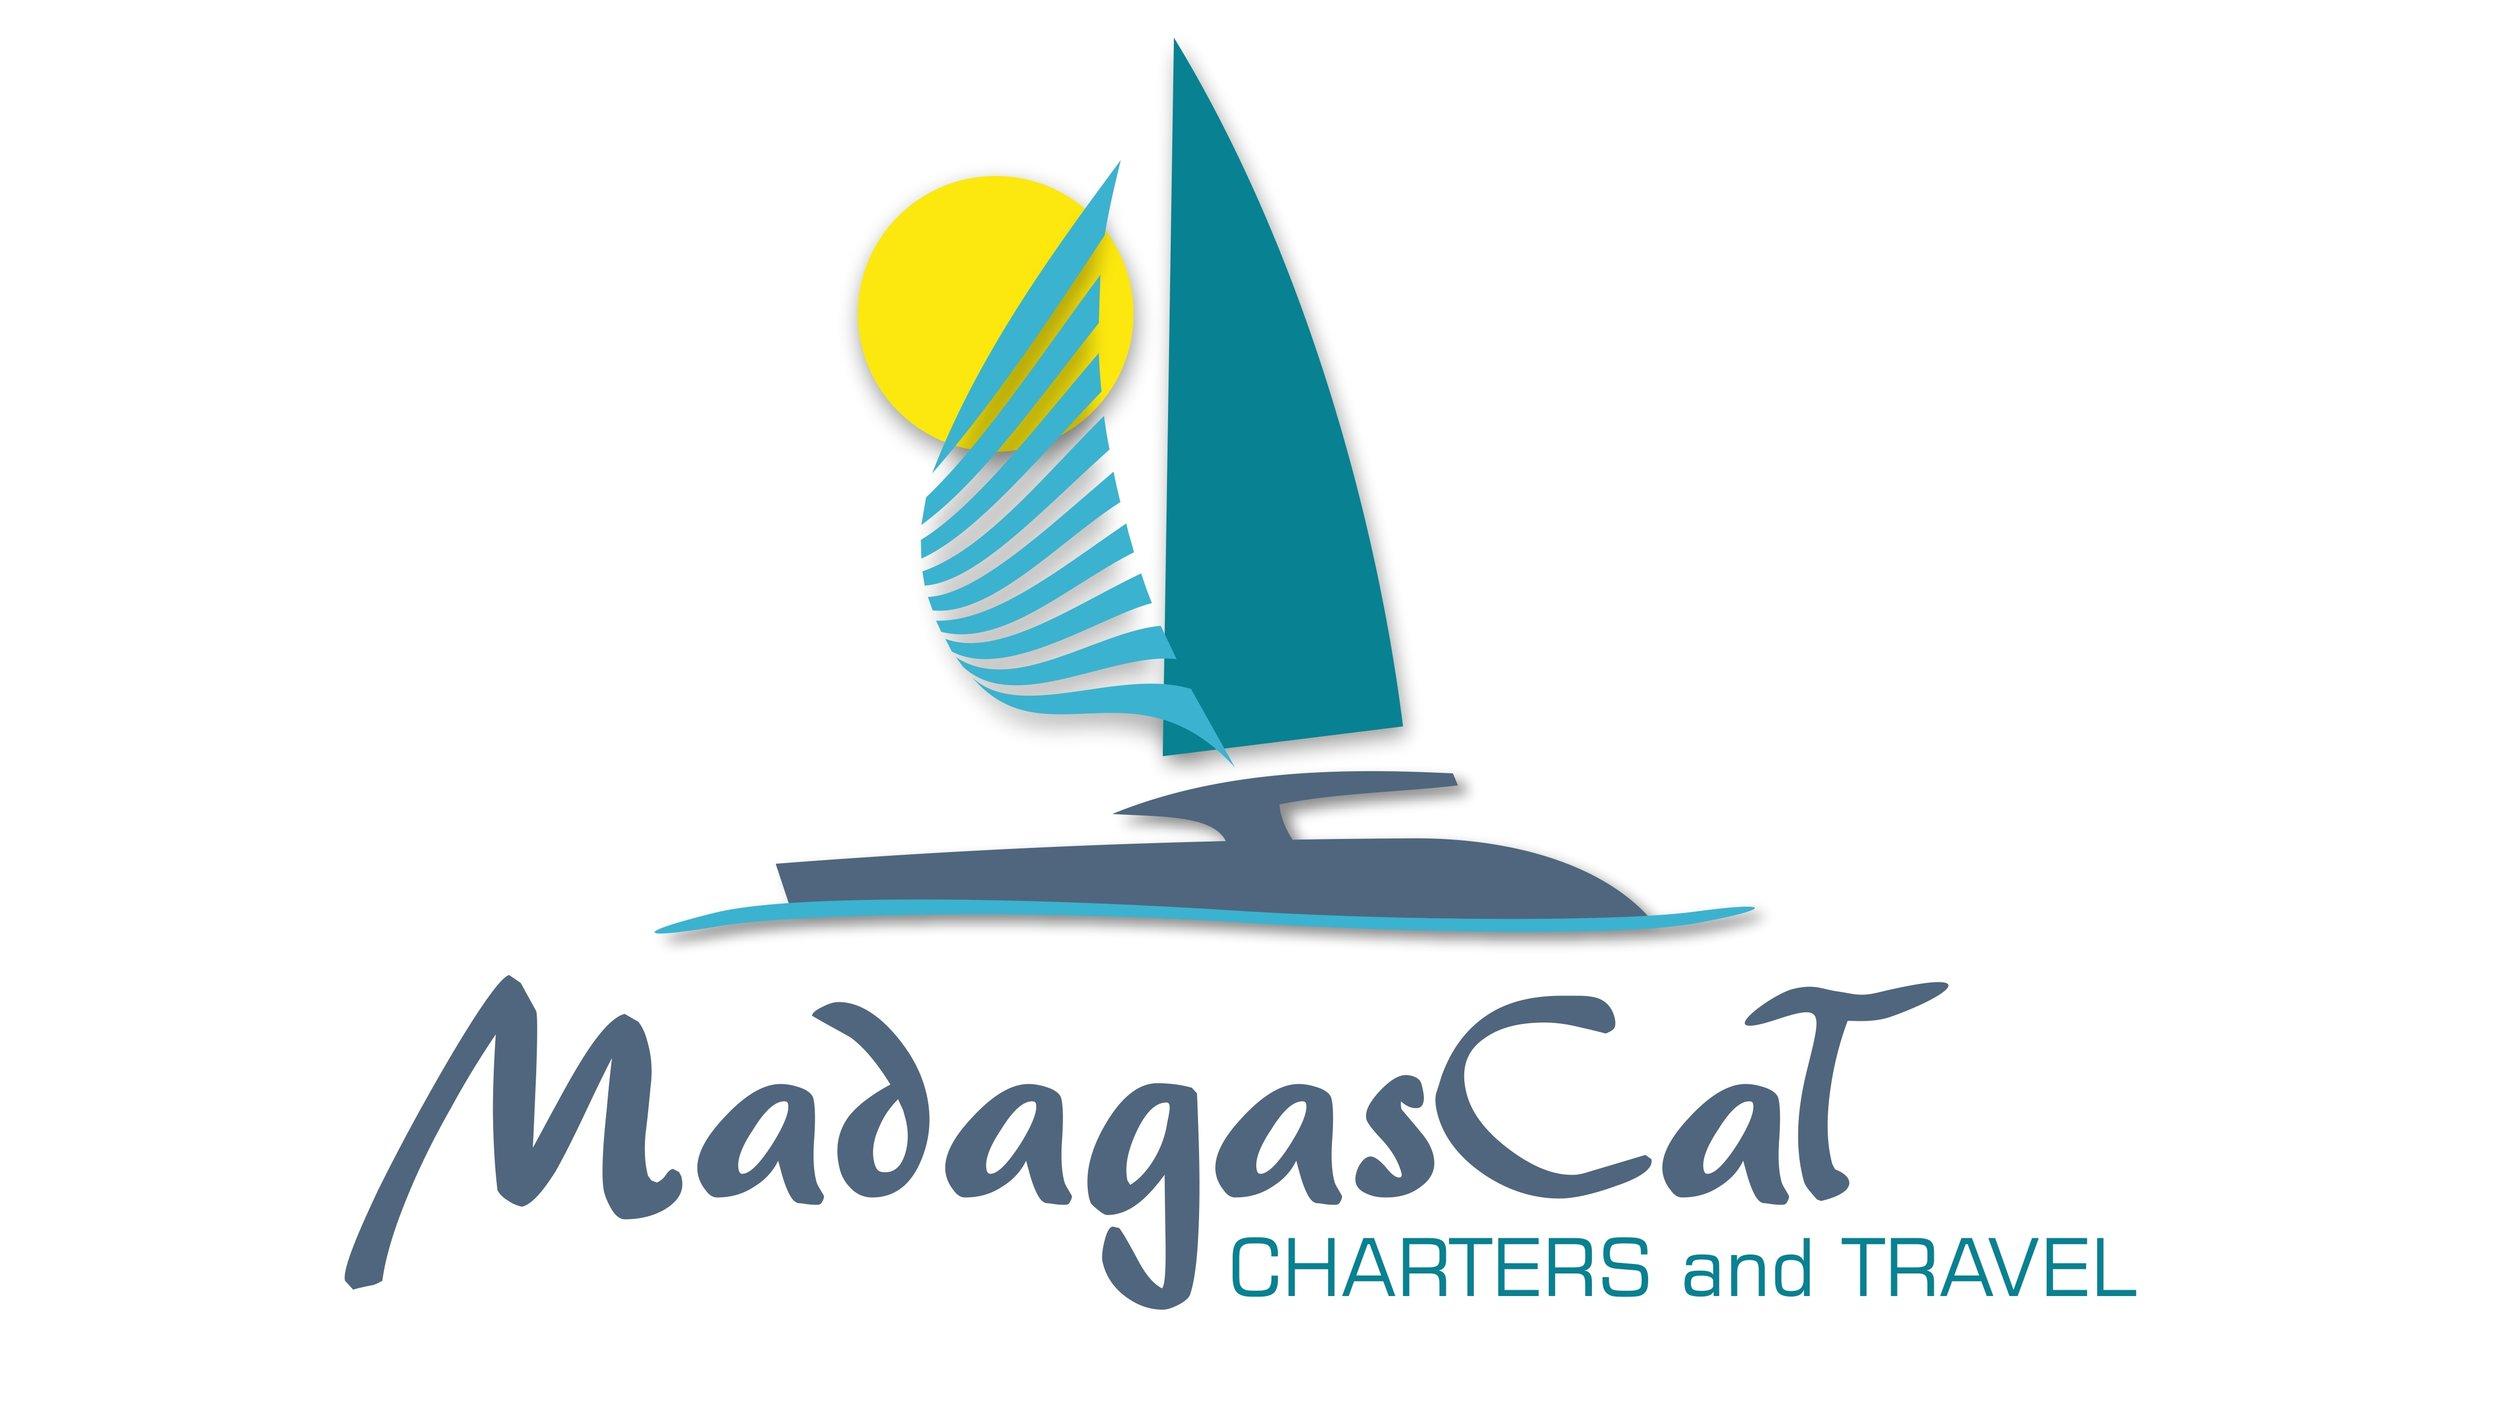 madagascat_logo - Copy.jpg